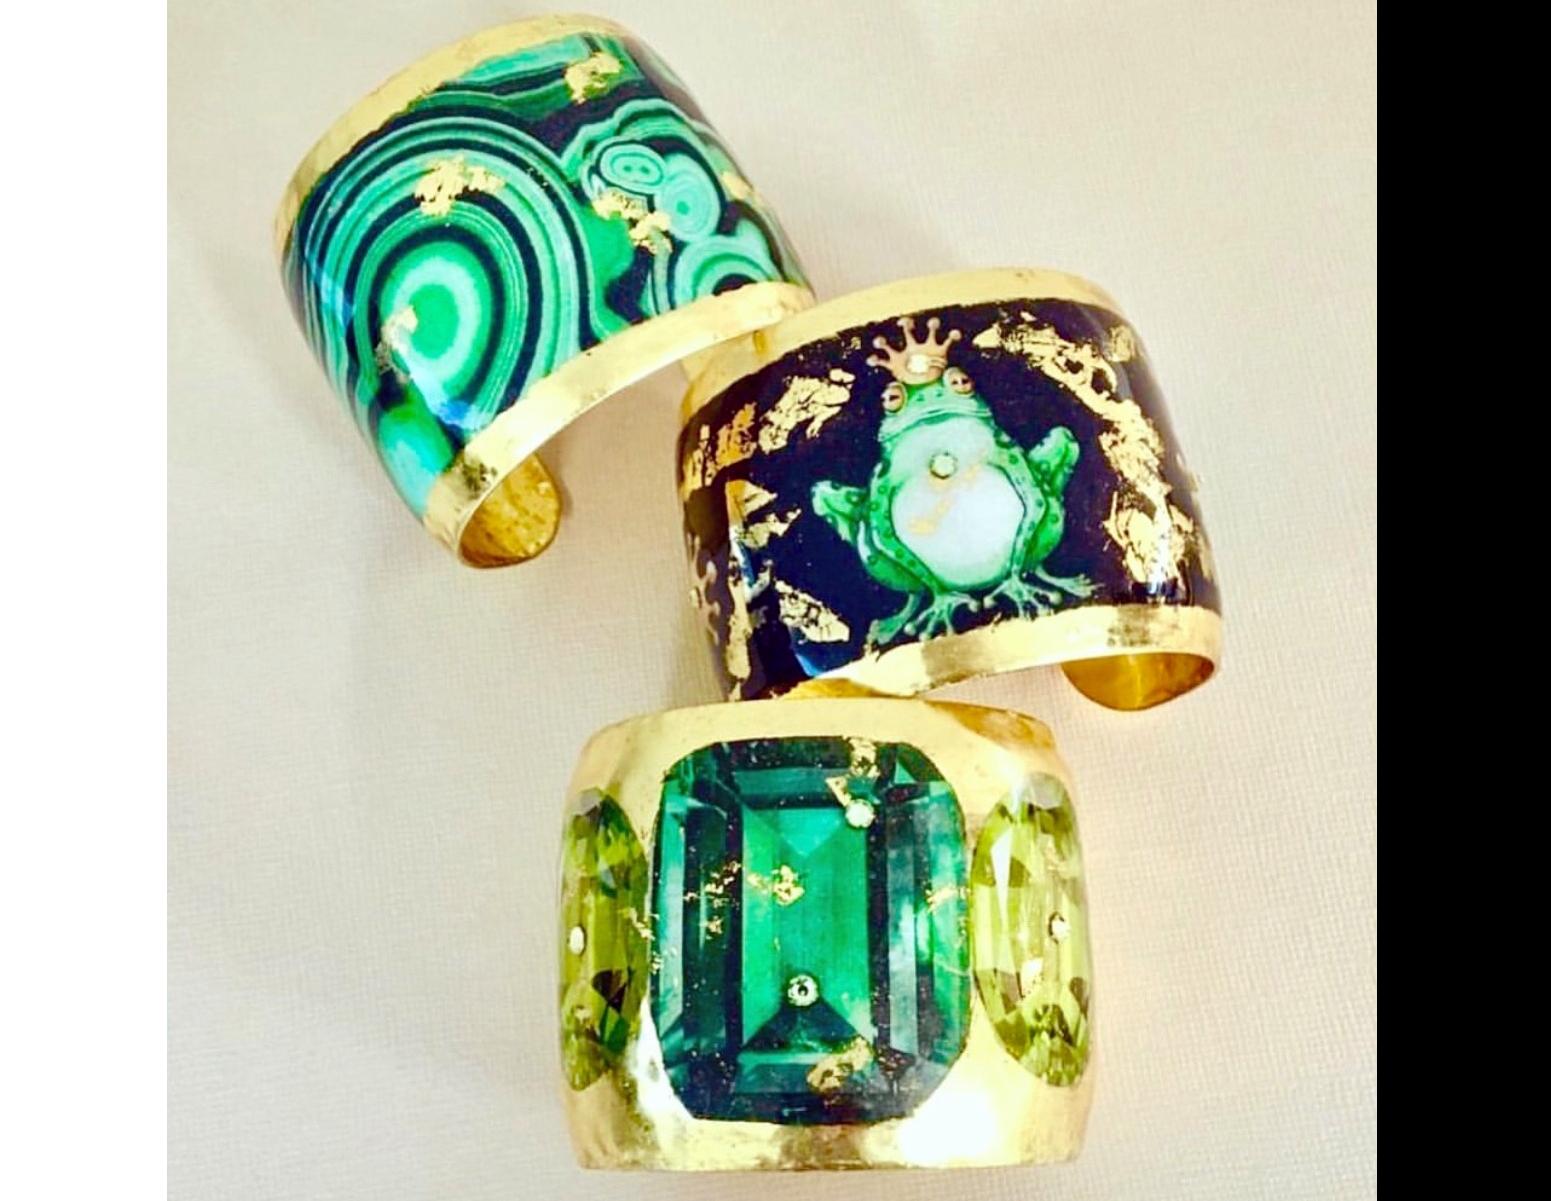 art jewelry, 22K gold leaf, fashion jewelry, Evocateur style, art on metal, gold leaf jewelry